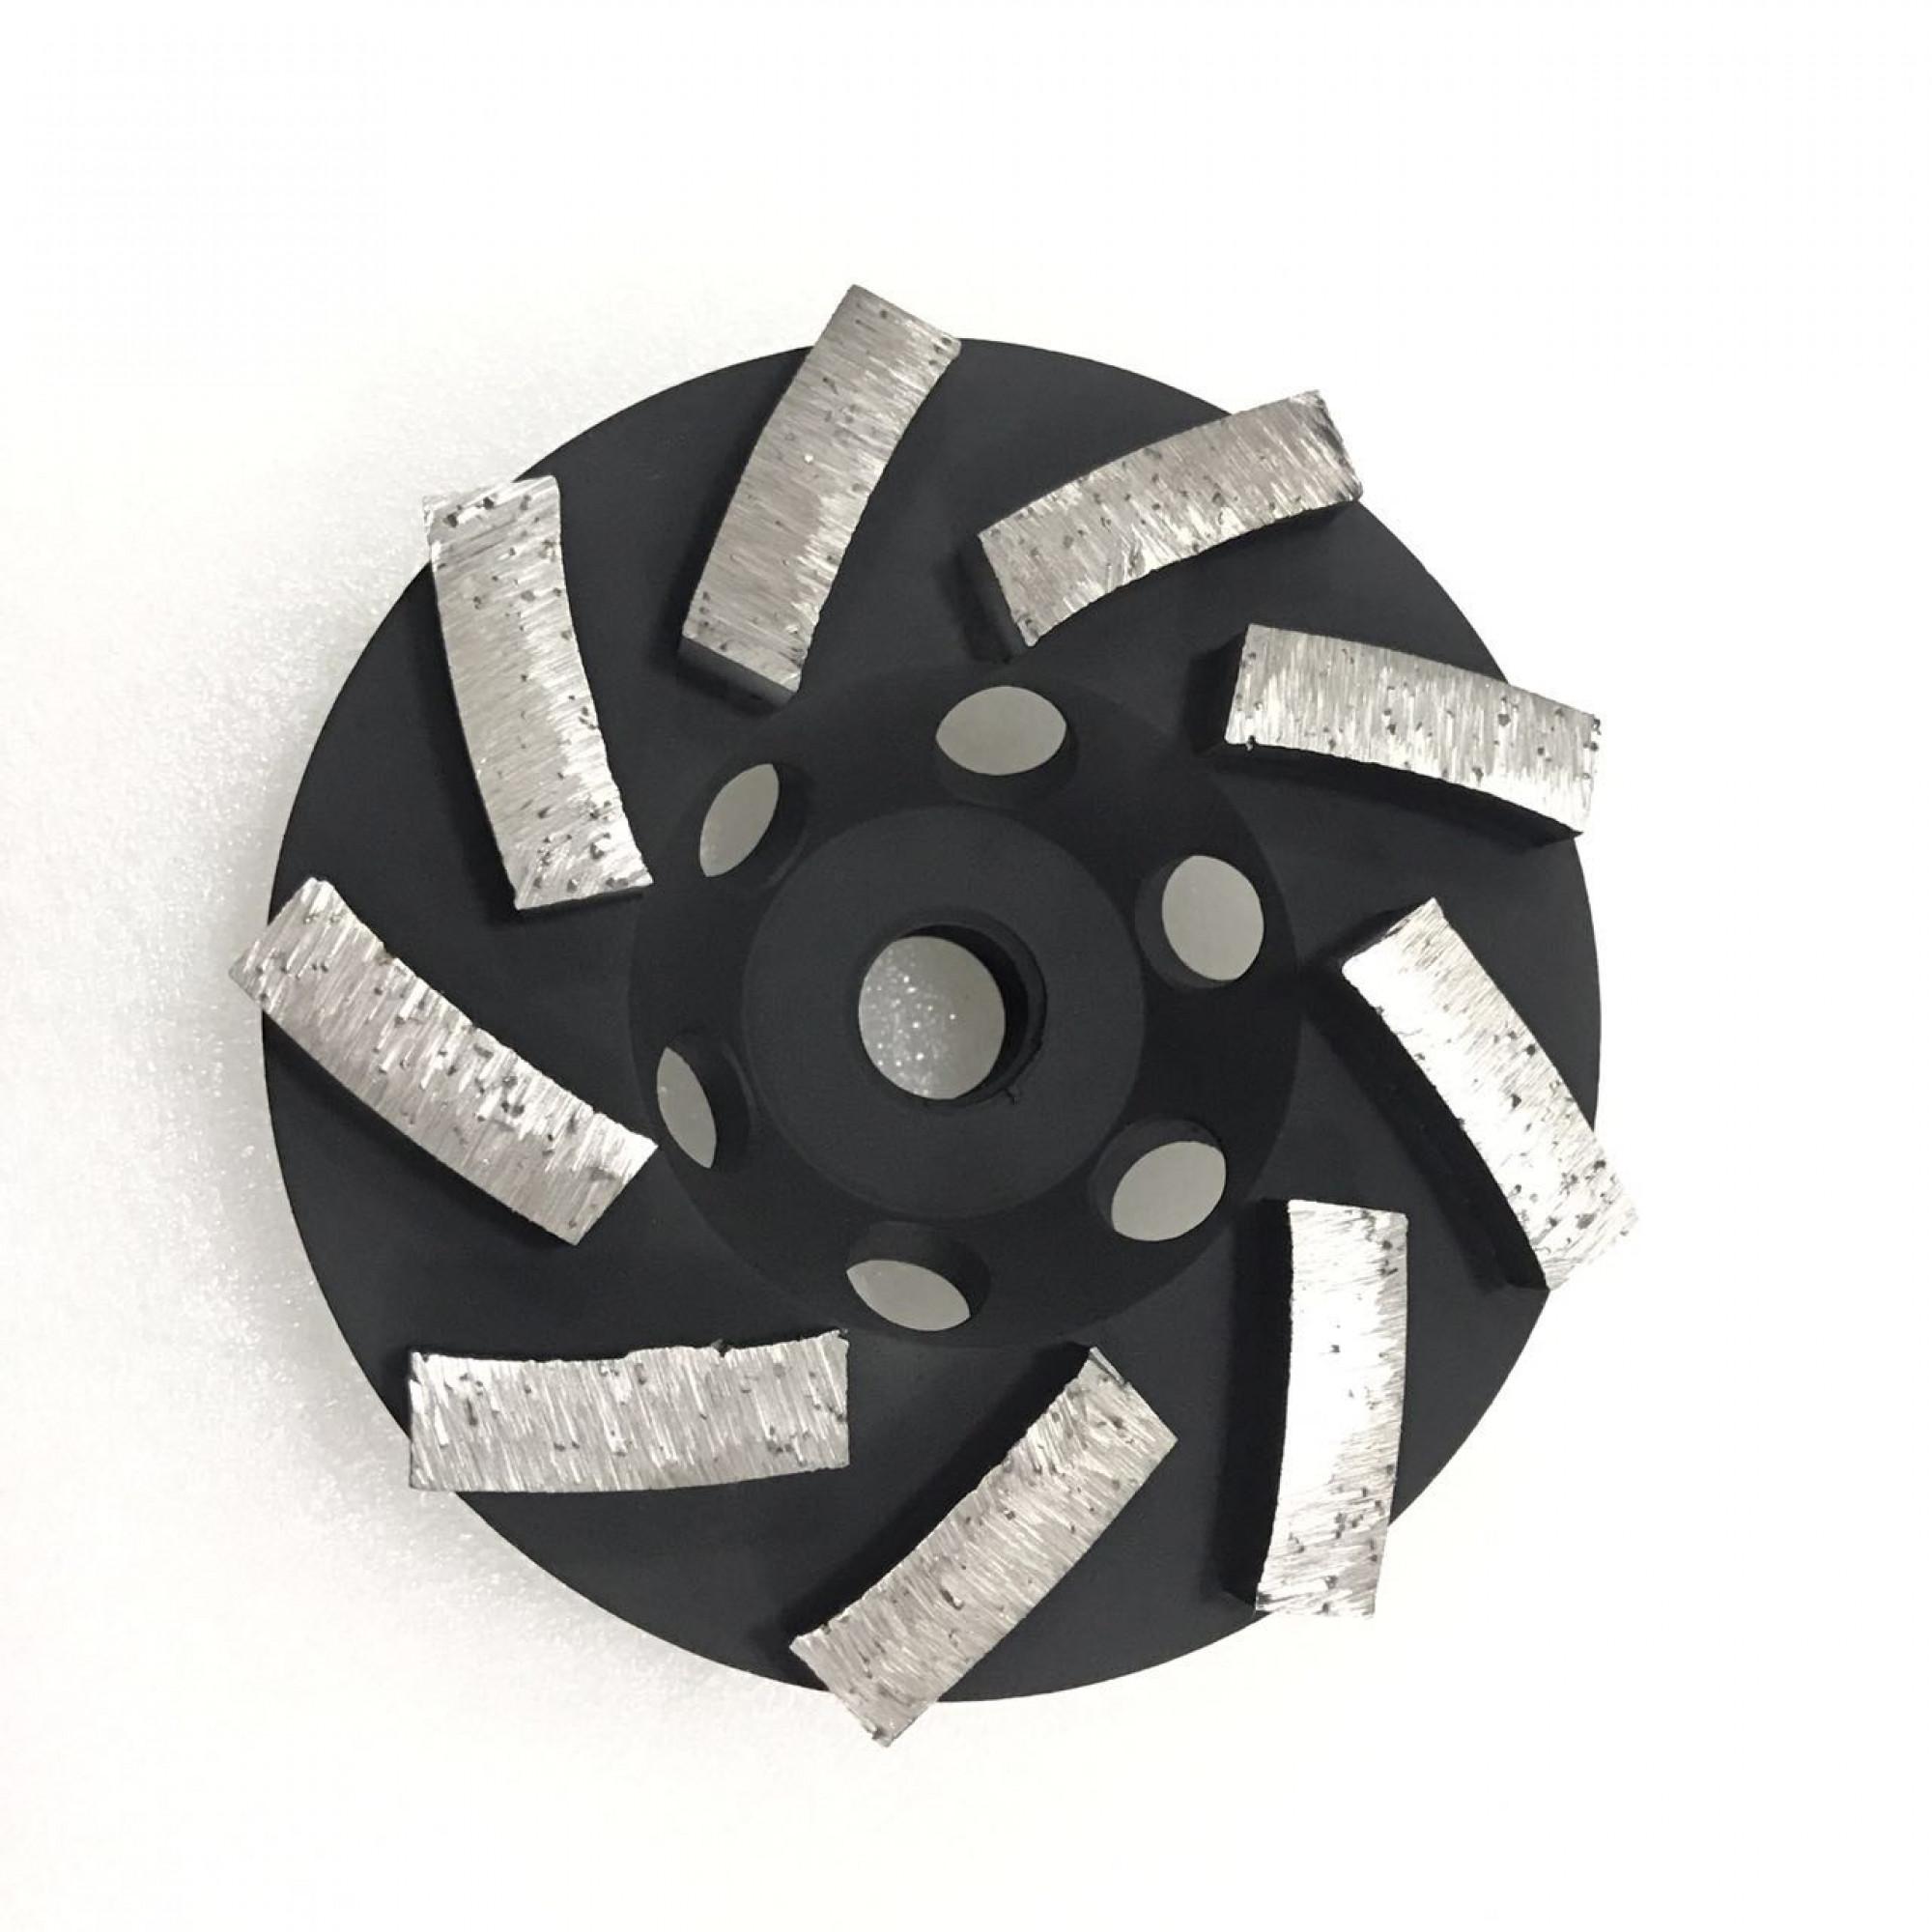 12 SEGMENT CUP WHEEL - 4 inch